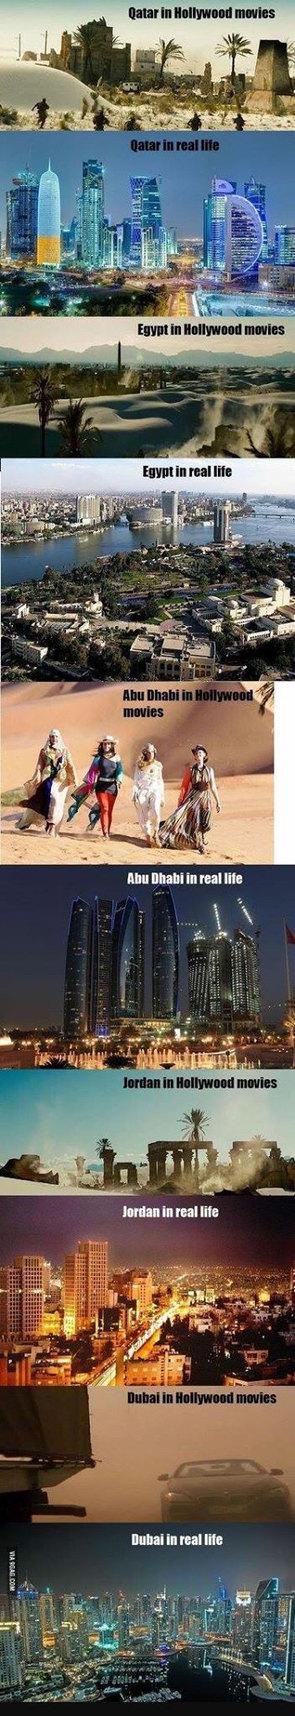 Hollywood vs. reality - meme